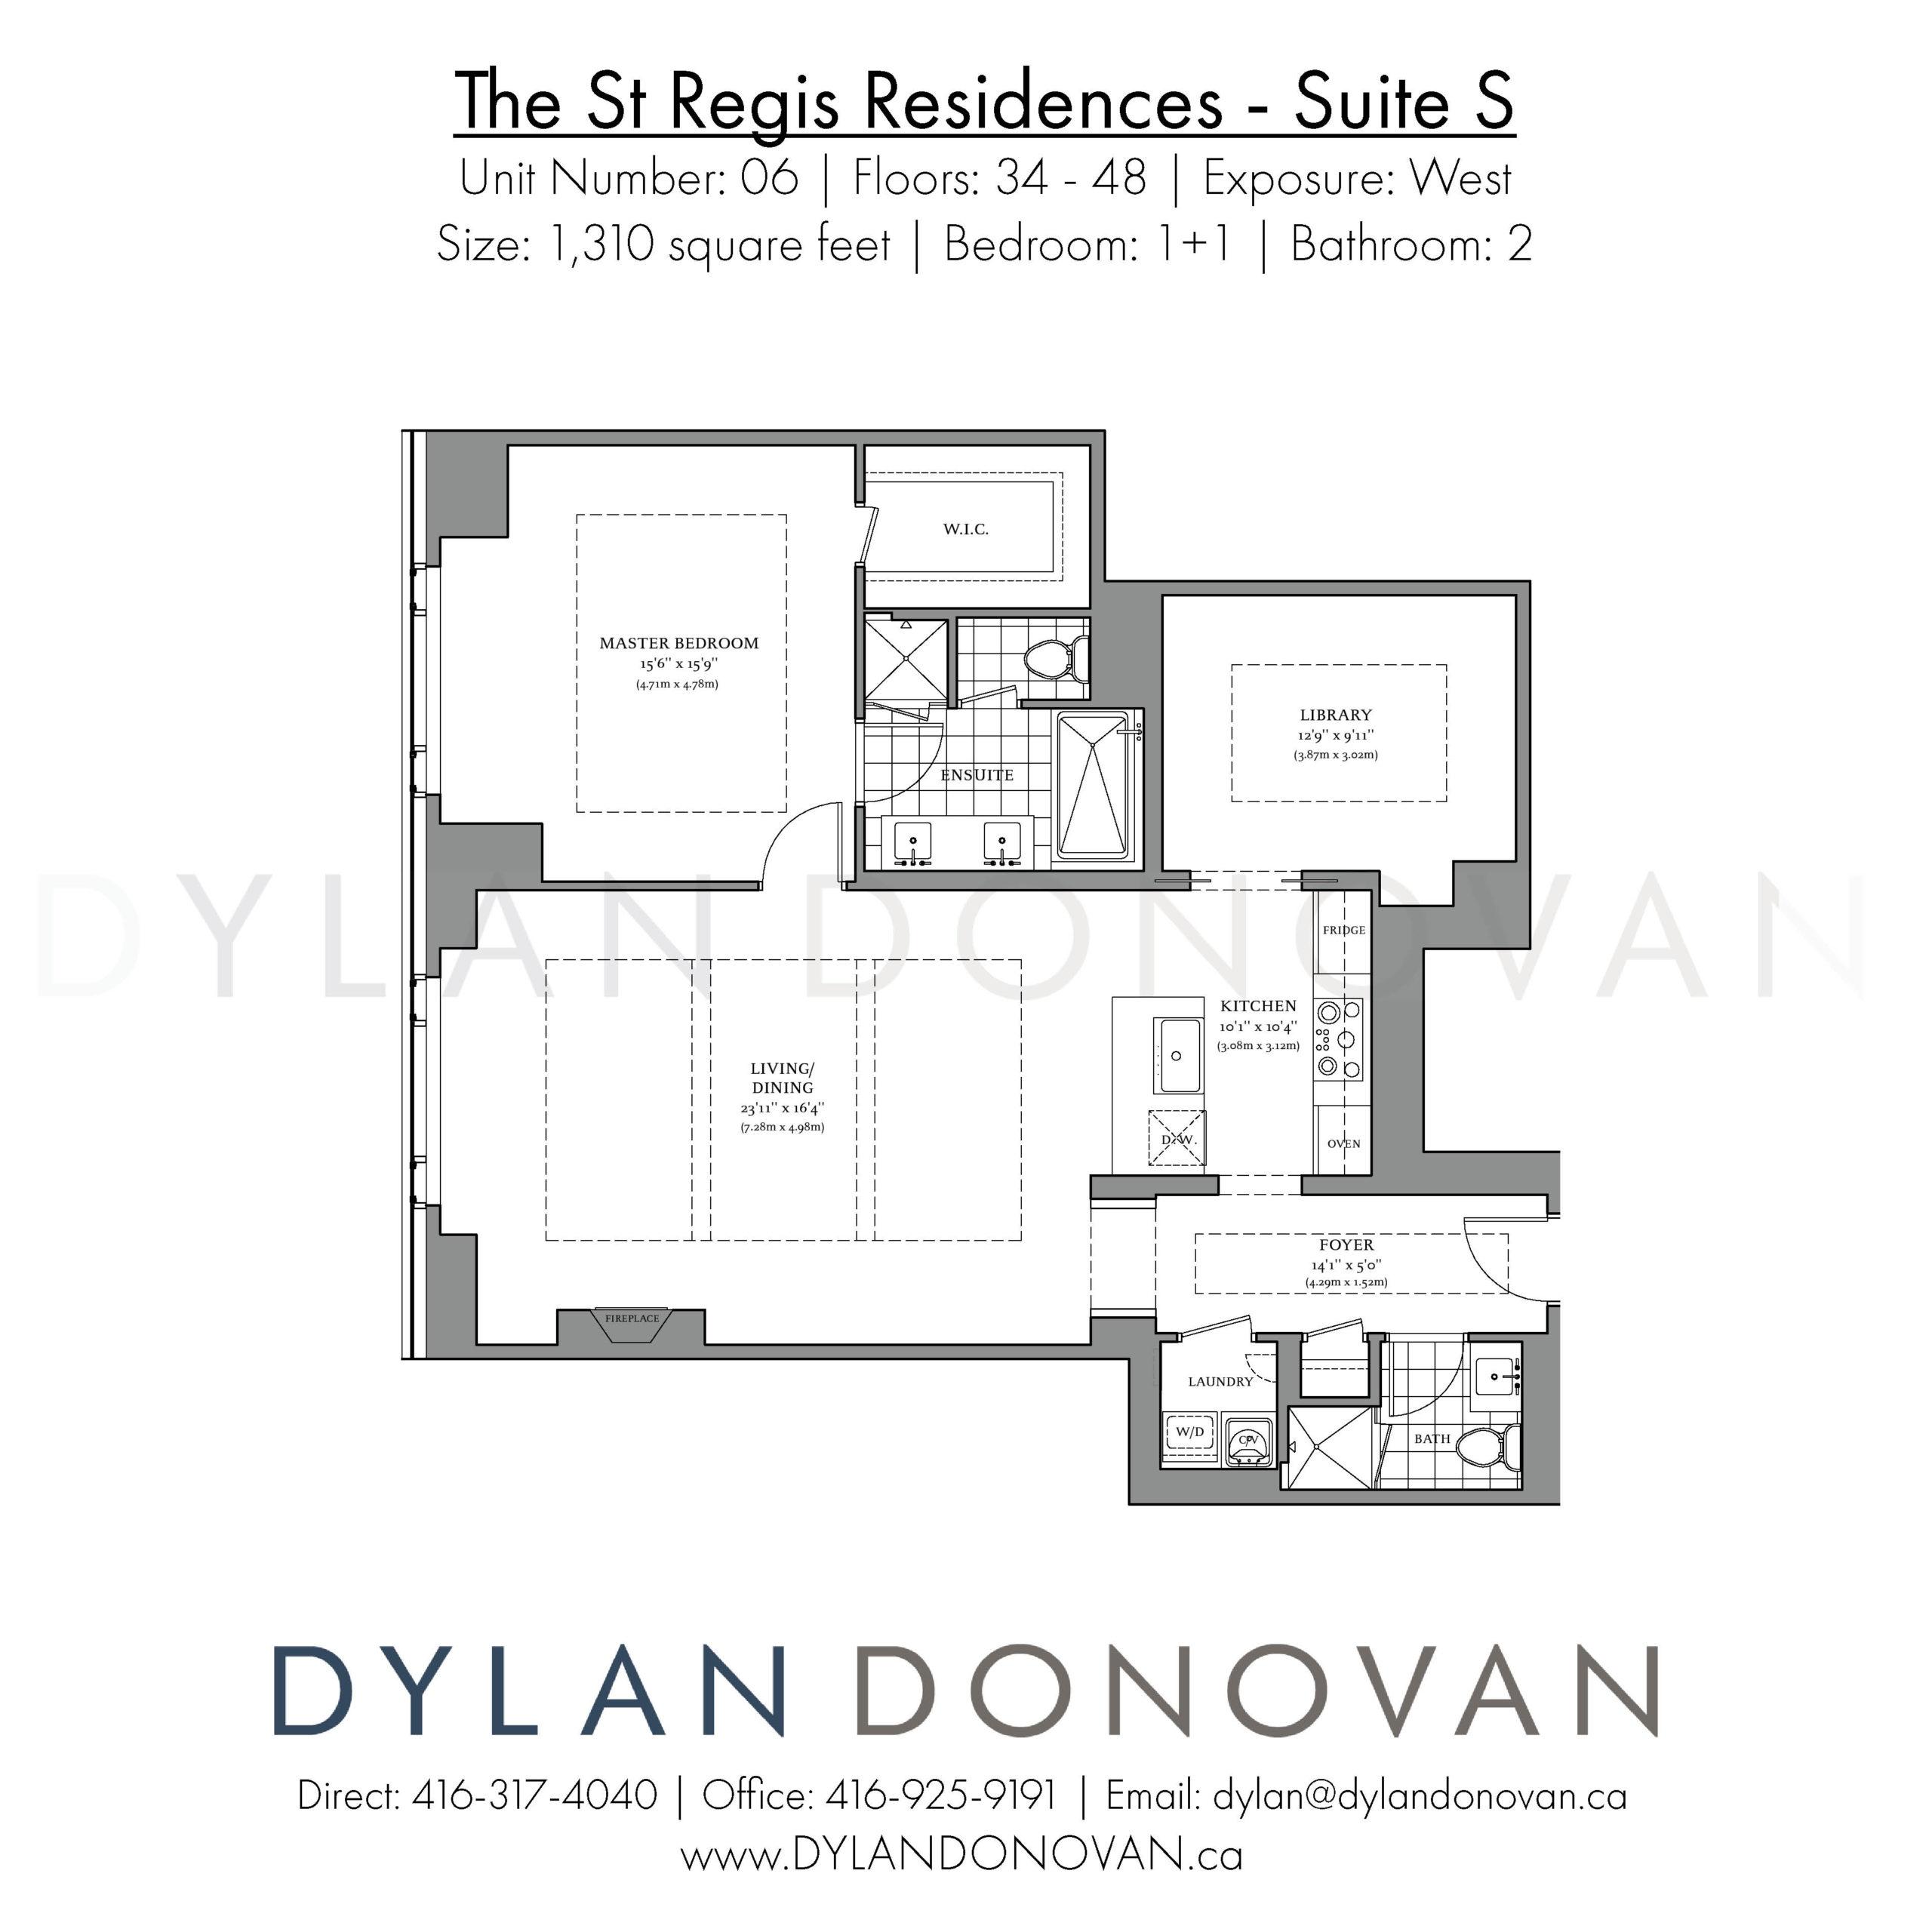 St Regis Residences 311 Bay Street Luxury Toronto Condos For Sale